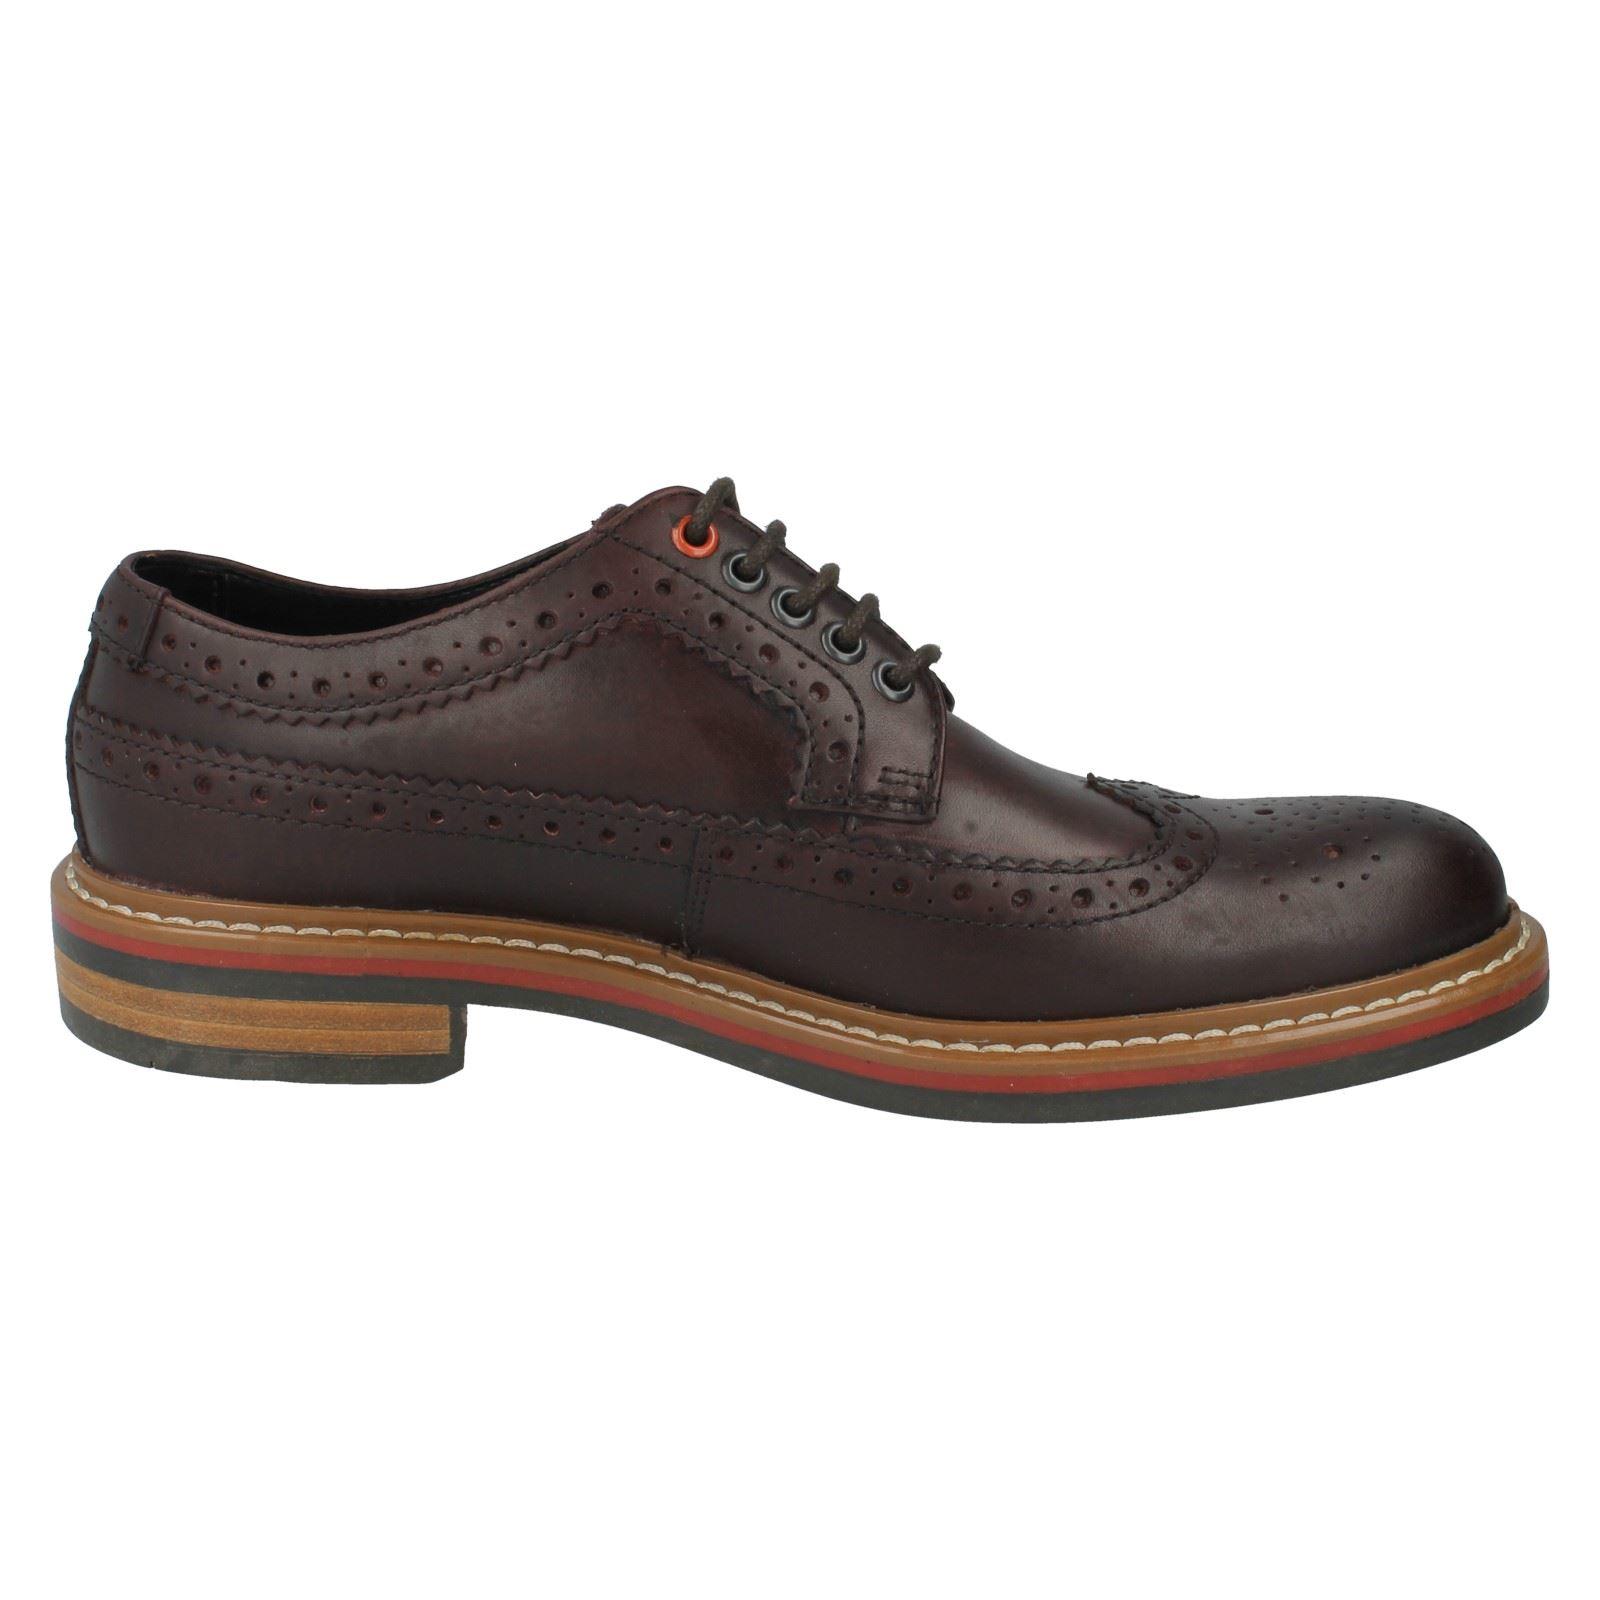 Men's Clarks Formal Schuhes Label Darby Limit GTX